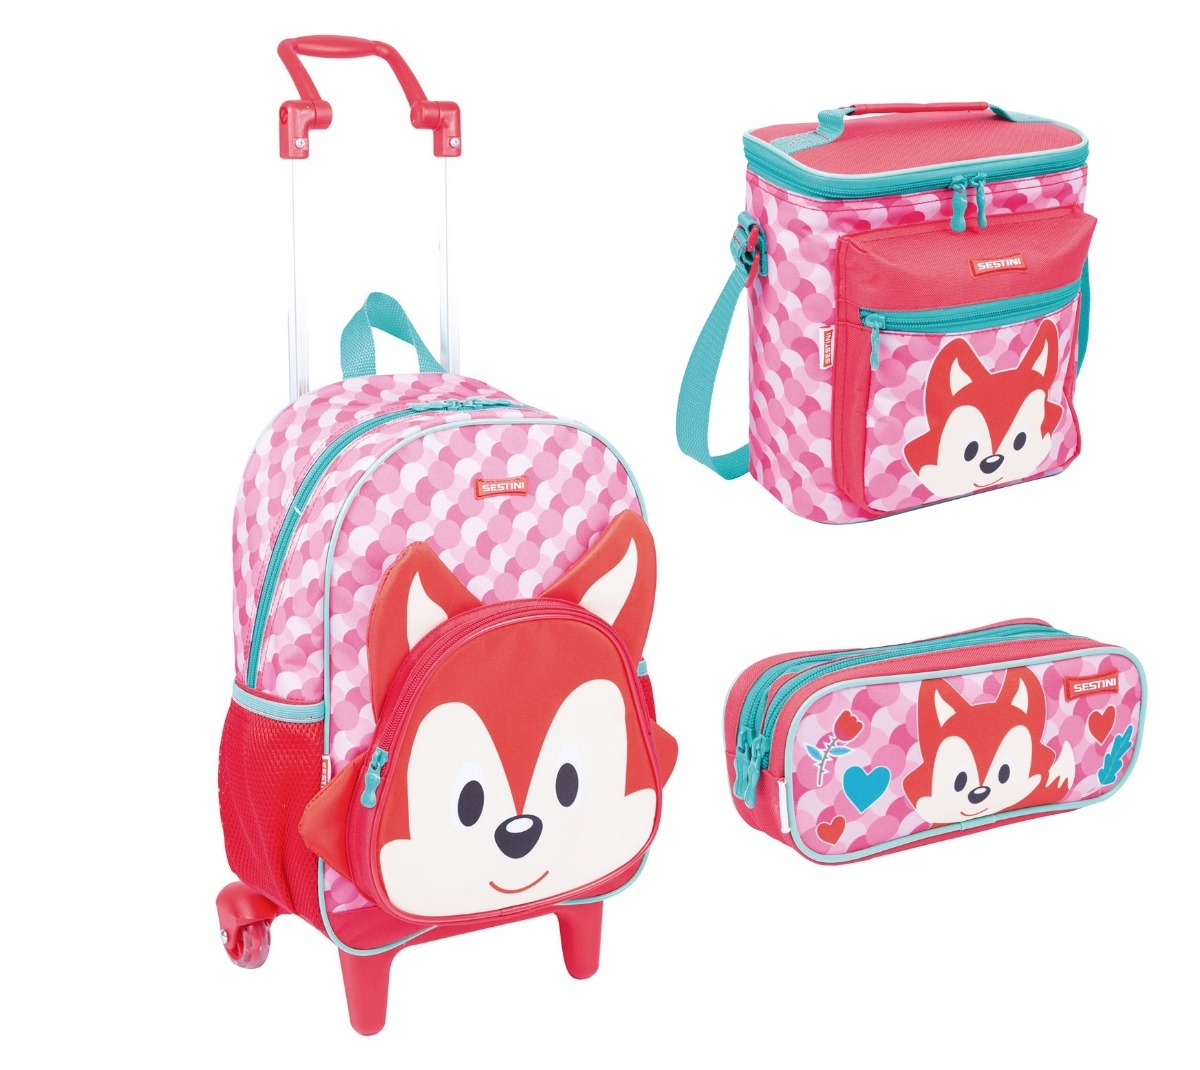 087a077b37 kit escolar mochila mochilete kids fox 19y - sestini. Carregando zoom.